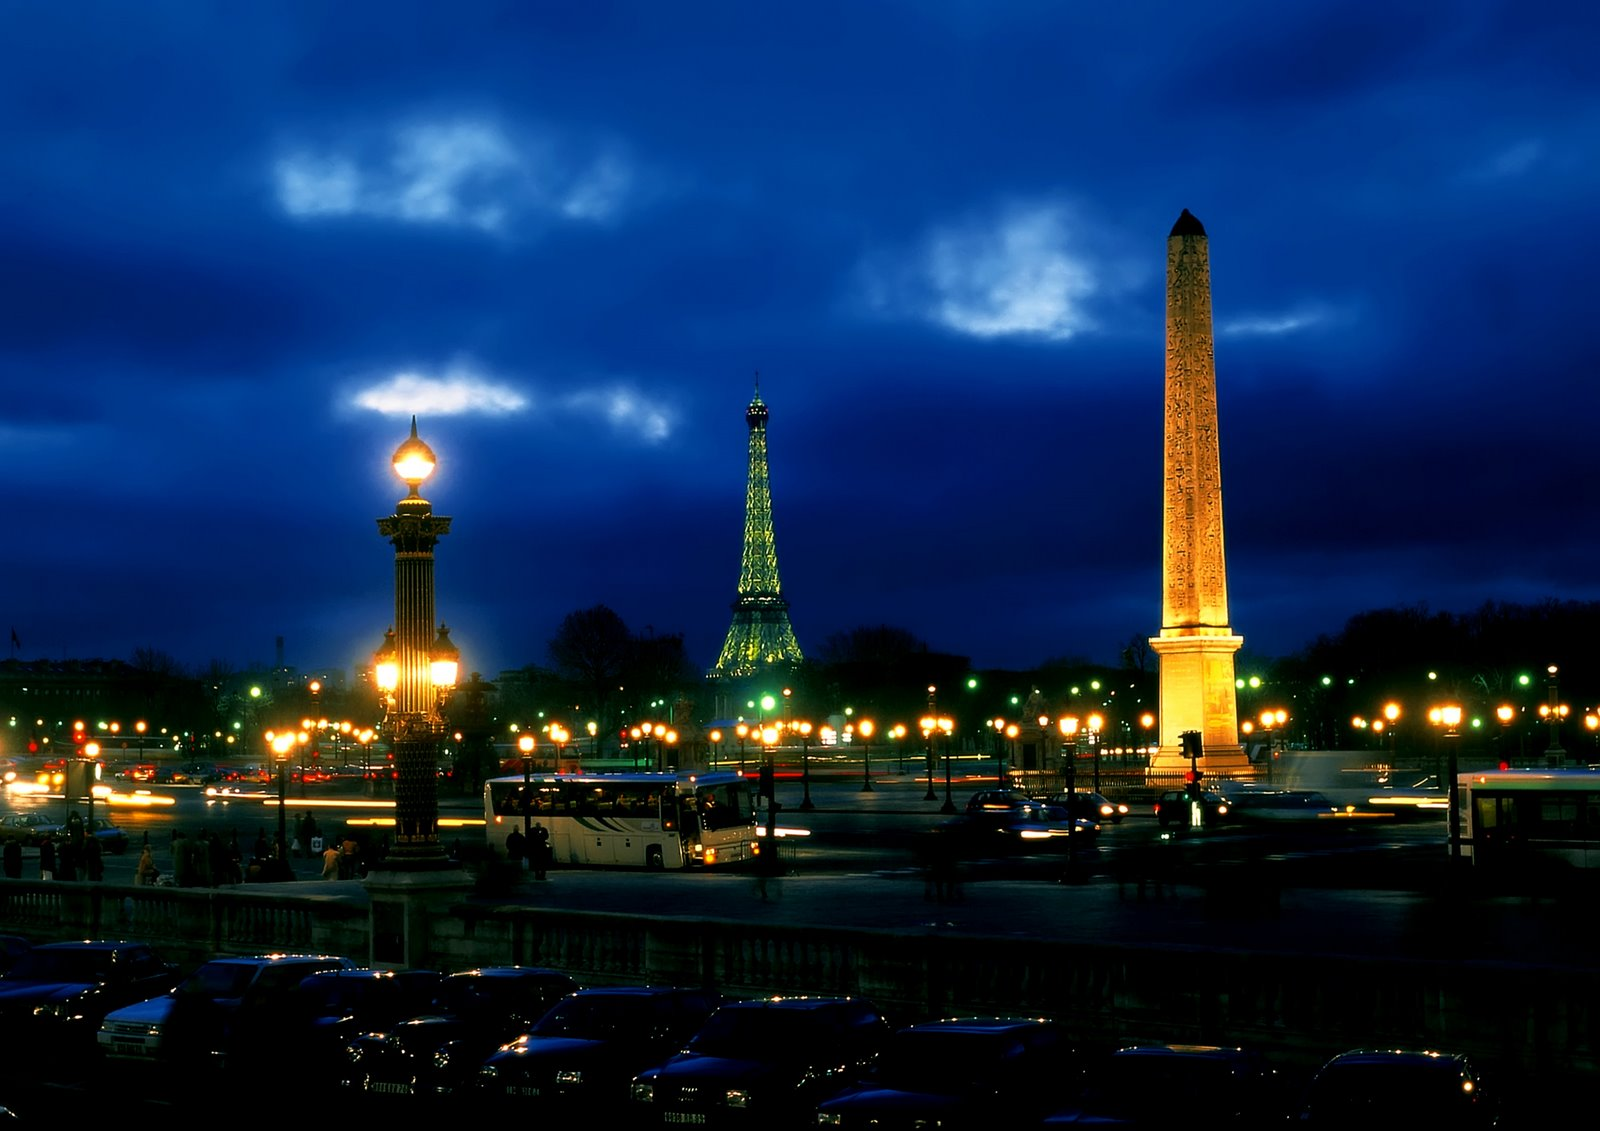 Paris Paris at Night Wallpaper 1600x1131